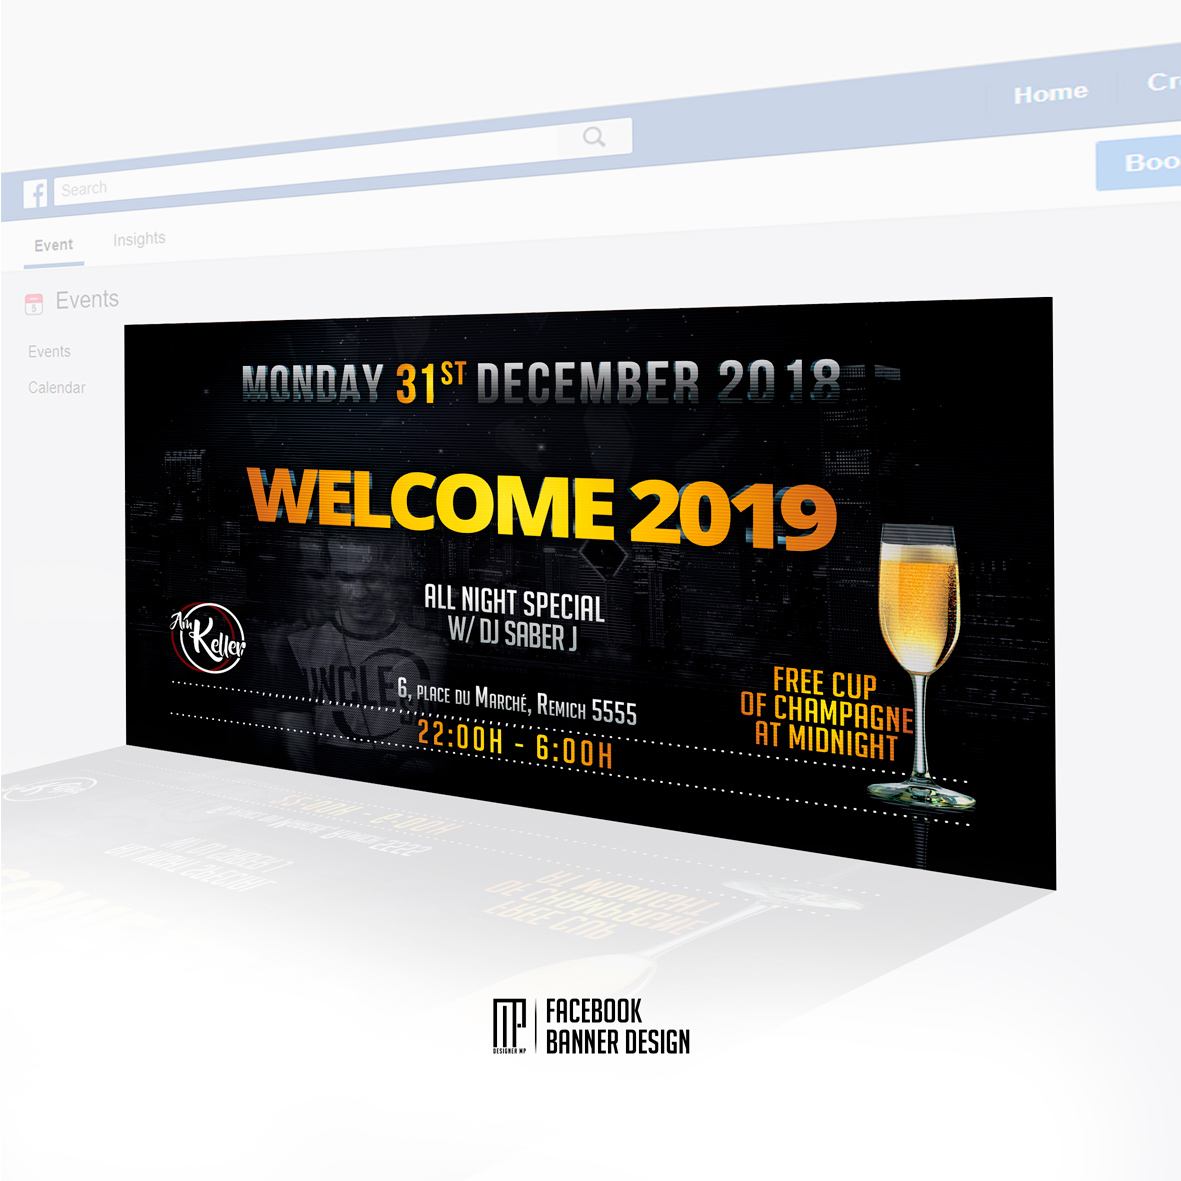 Fb-Banner-Mockup---Am-Keller-Welcome-2019.jpg